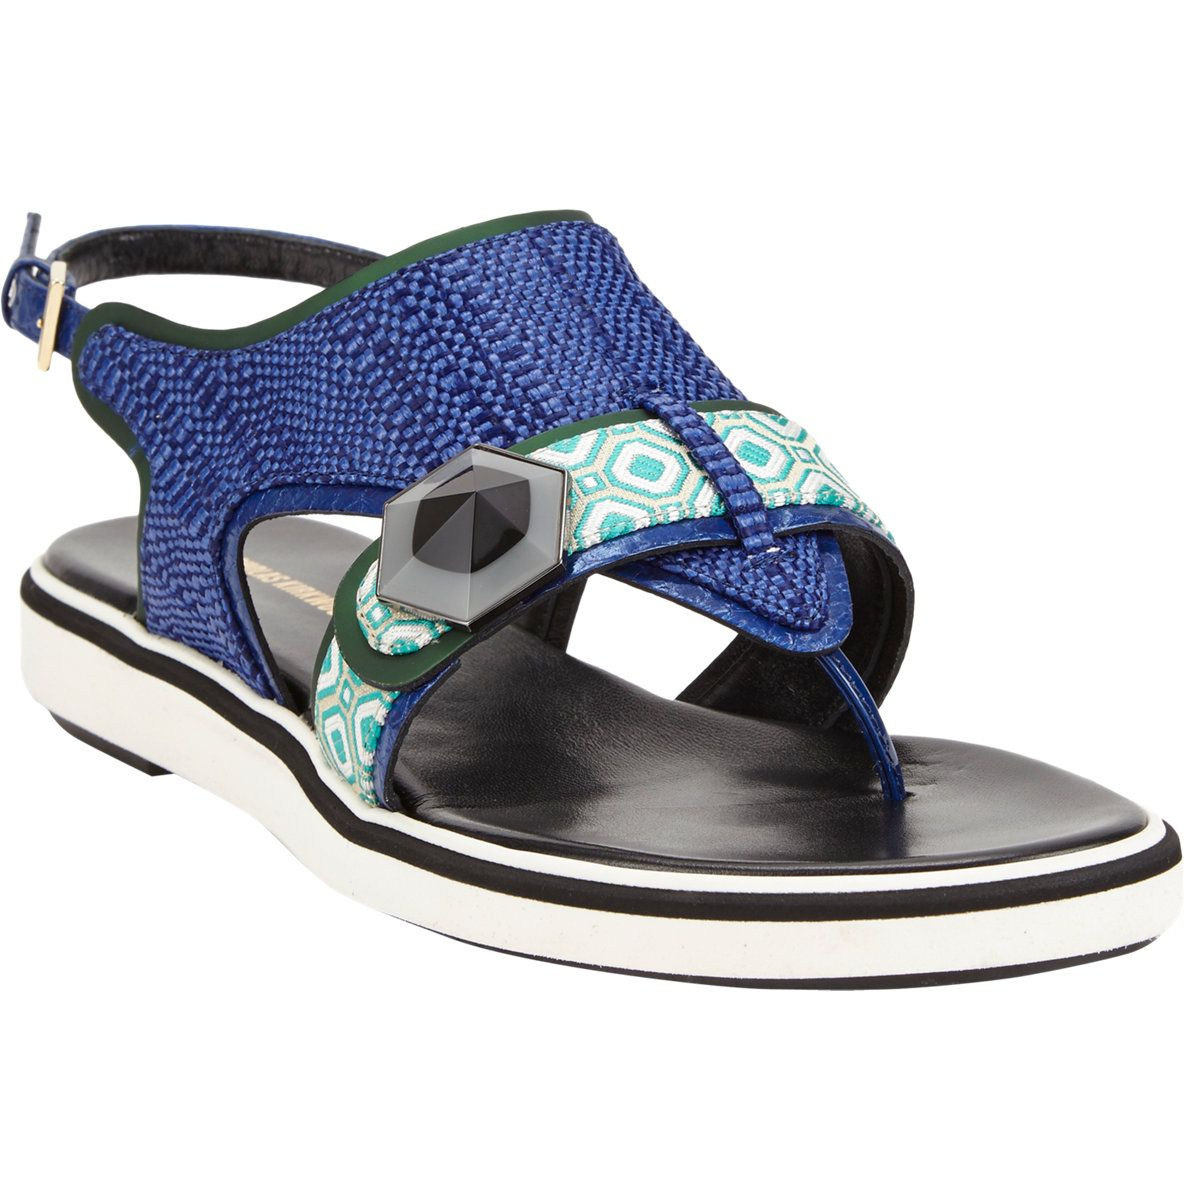 Nicholas Kirkwood Jacquard Thong Slingback Sandals at Barneys.com